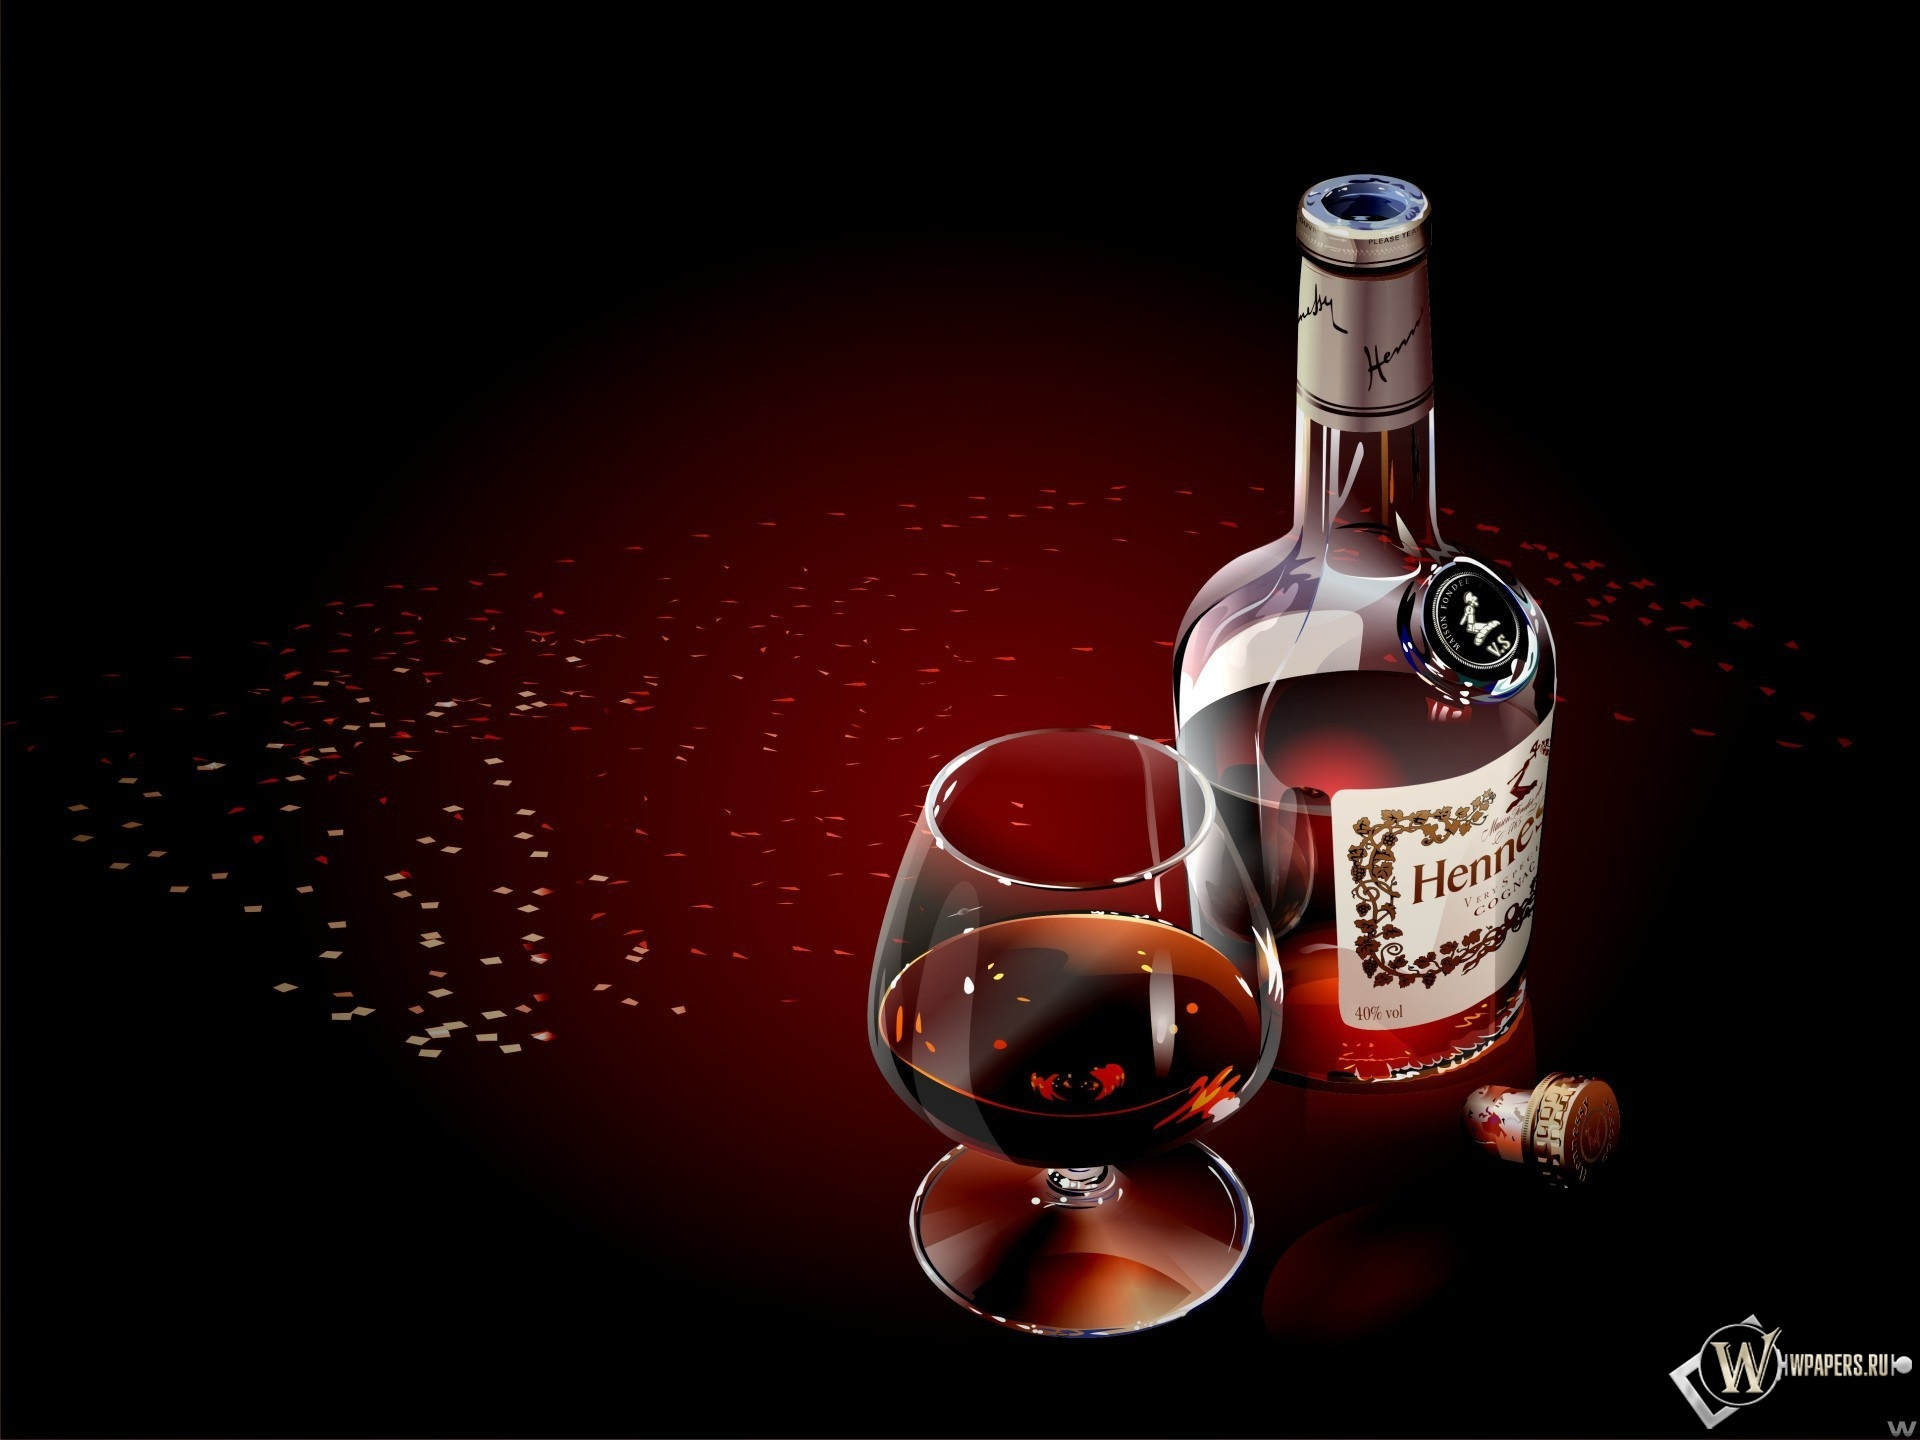 Коньяк Hennessy Black 1920x1440